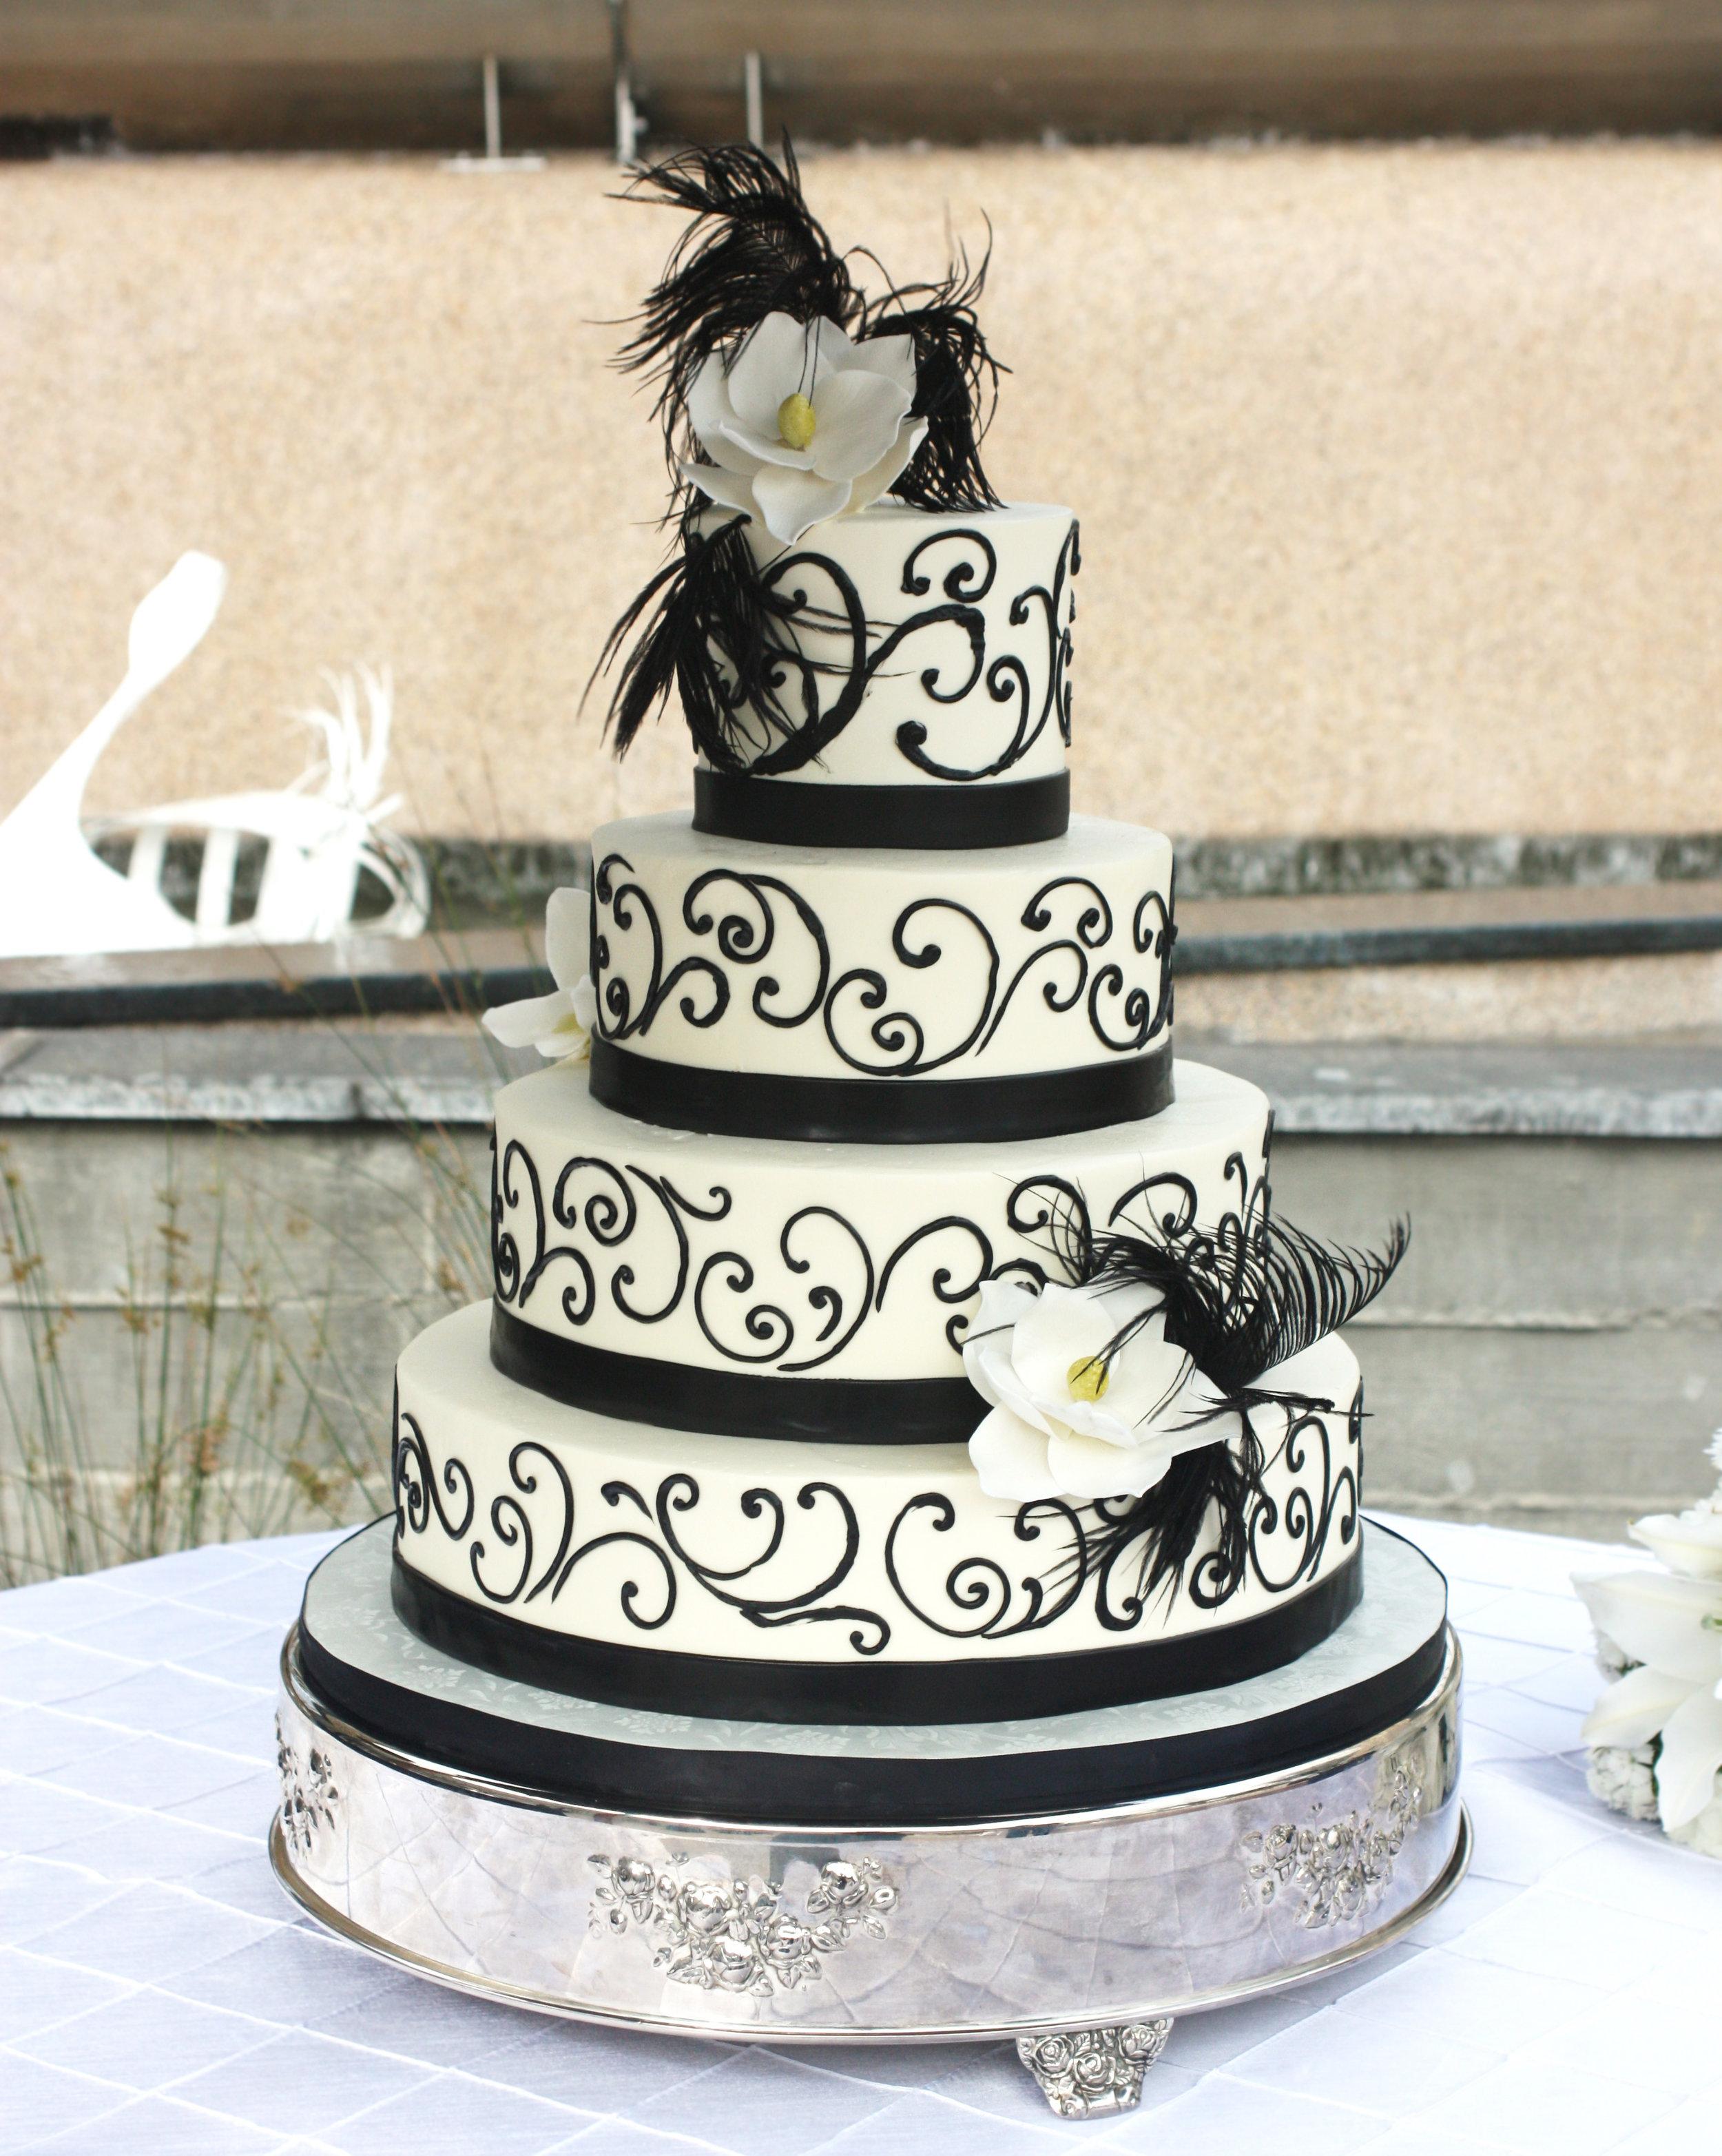 Black & white magnolia cake.jpg